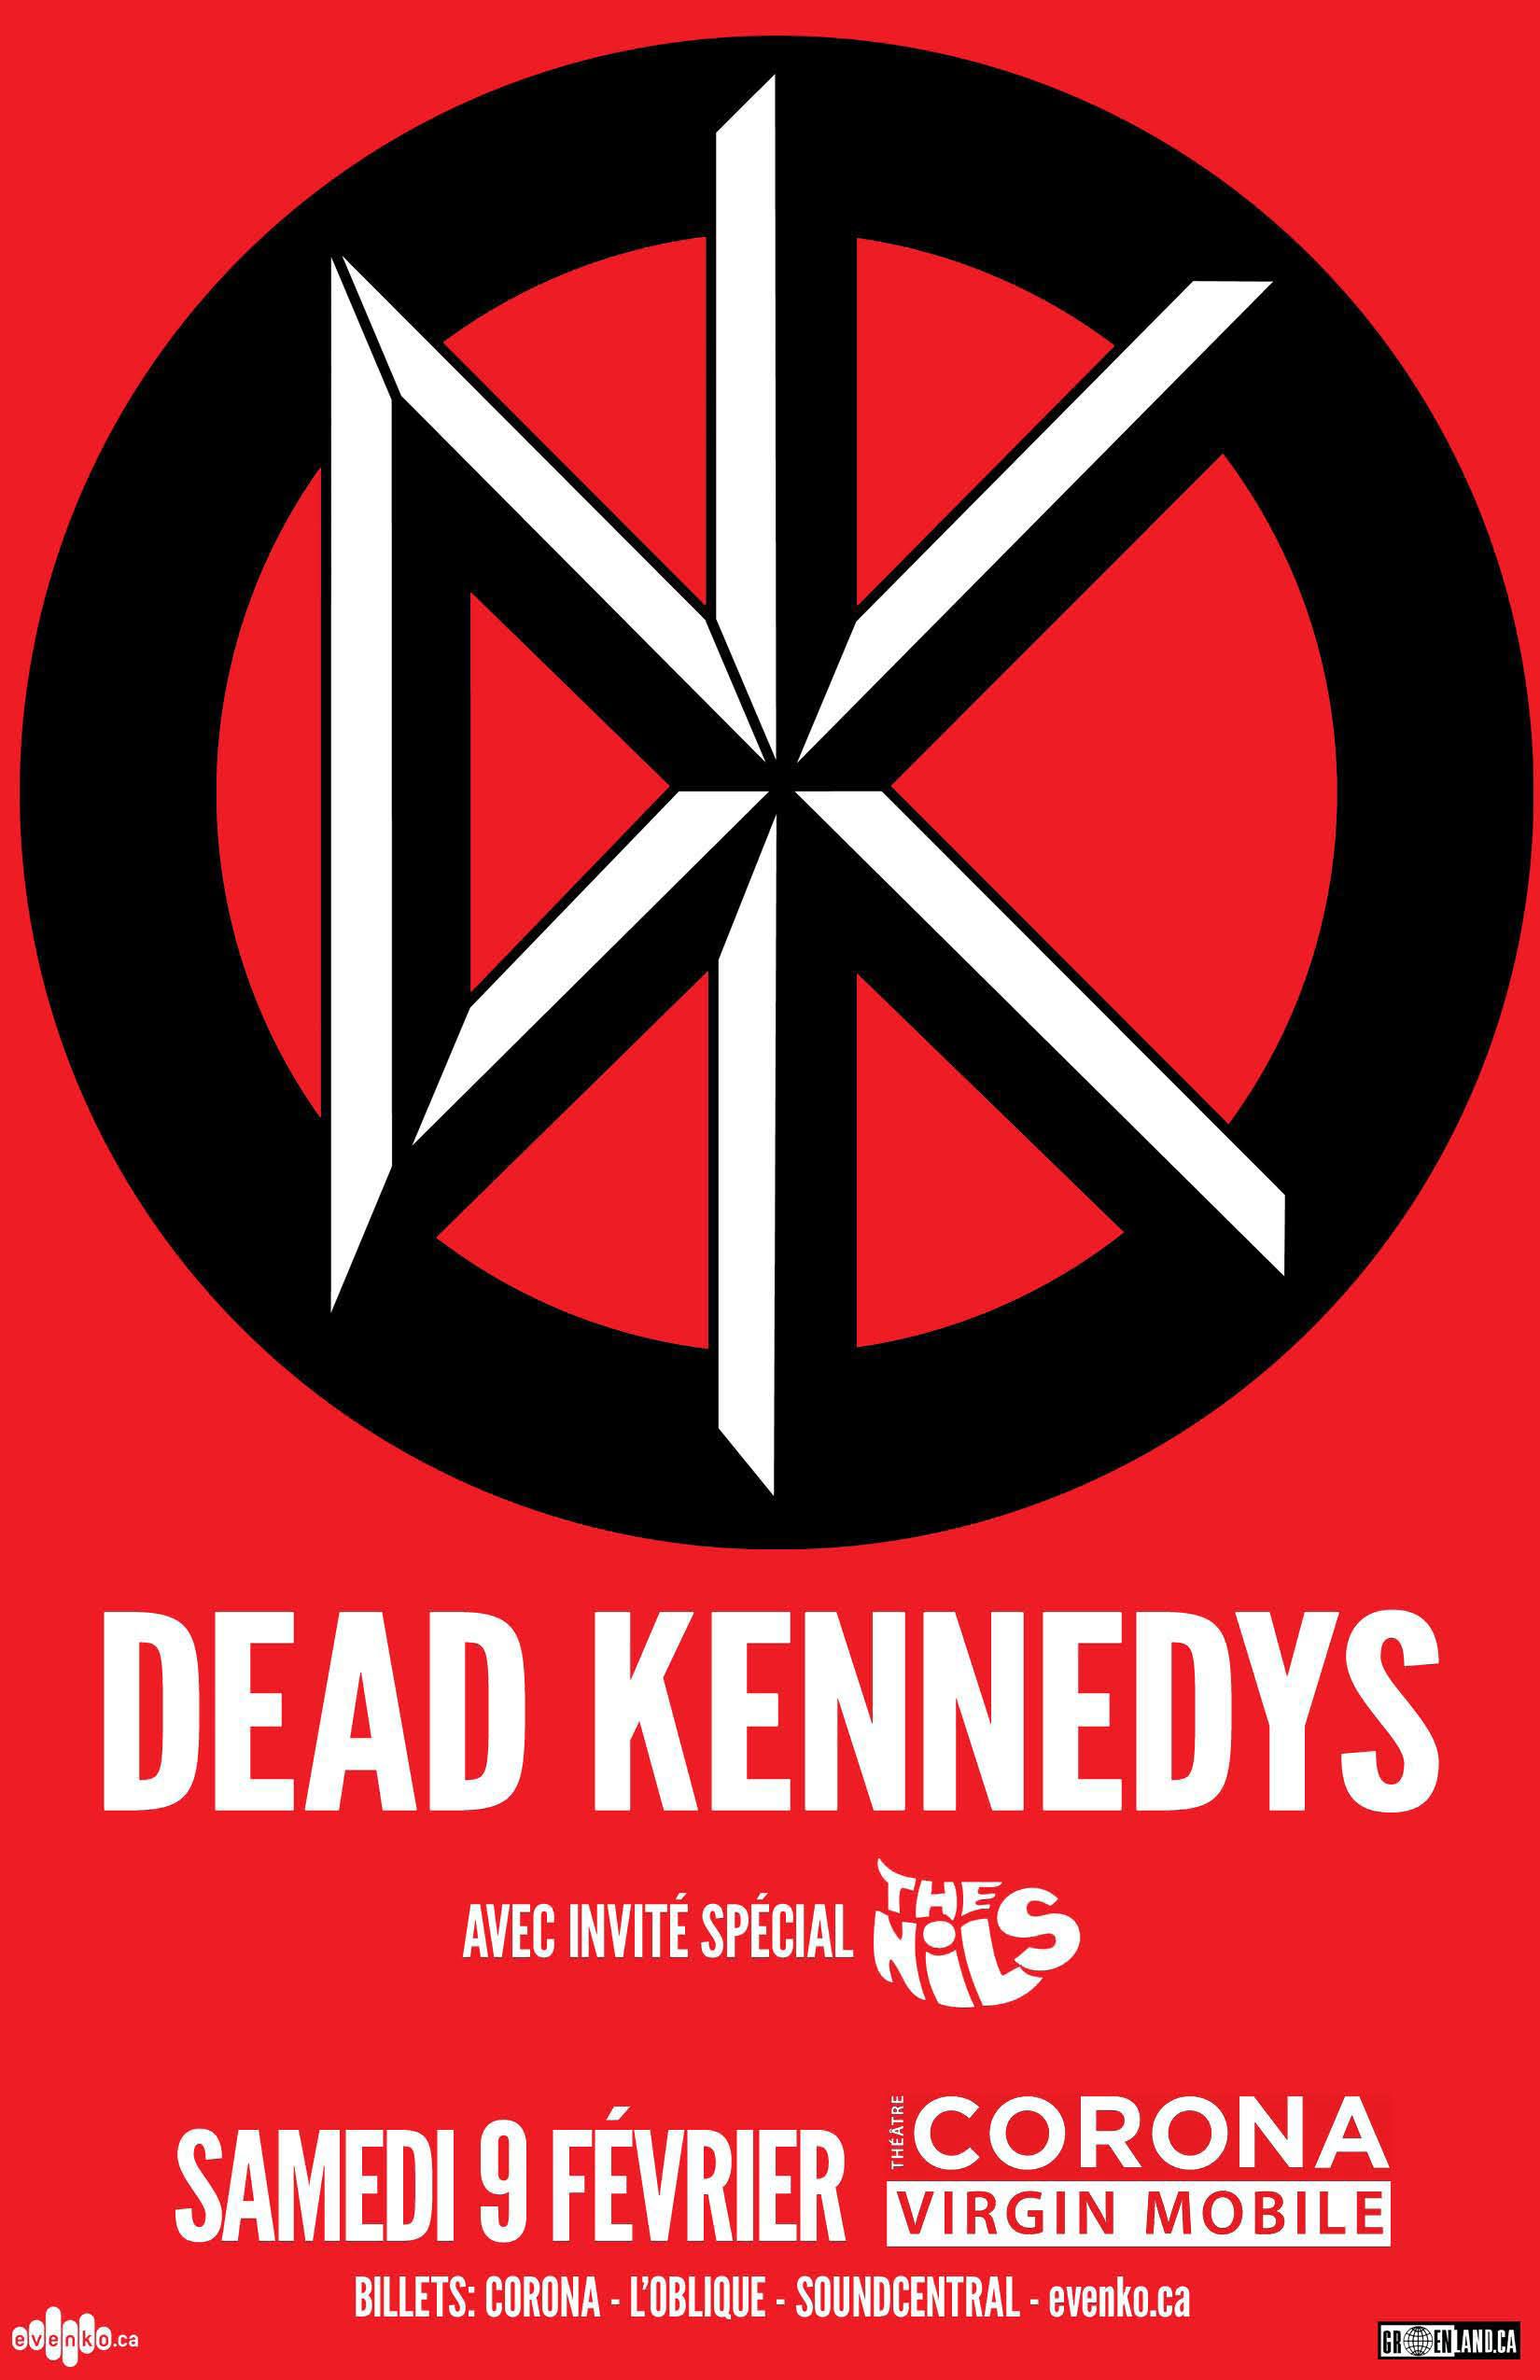 130209_DeadKennedys_poster